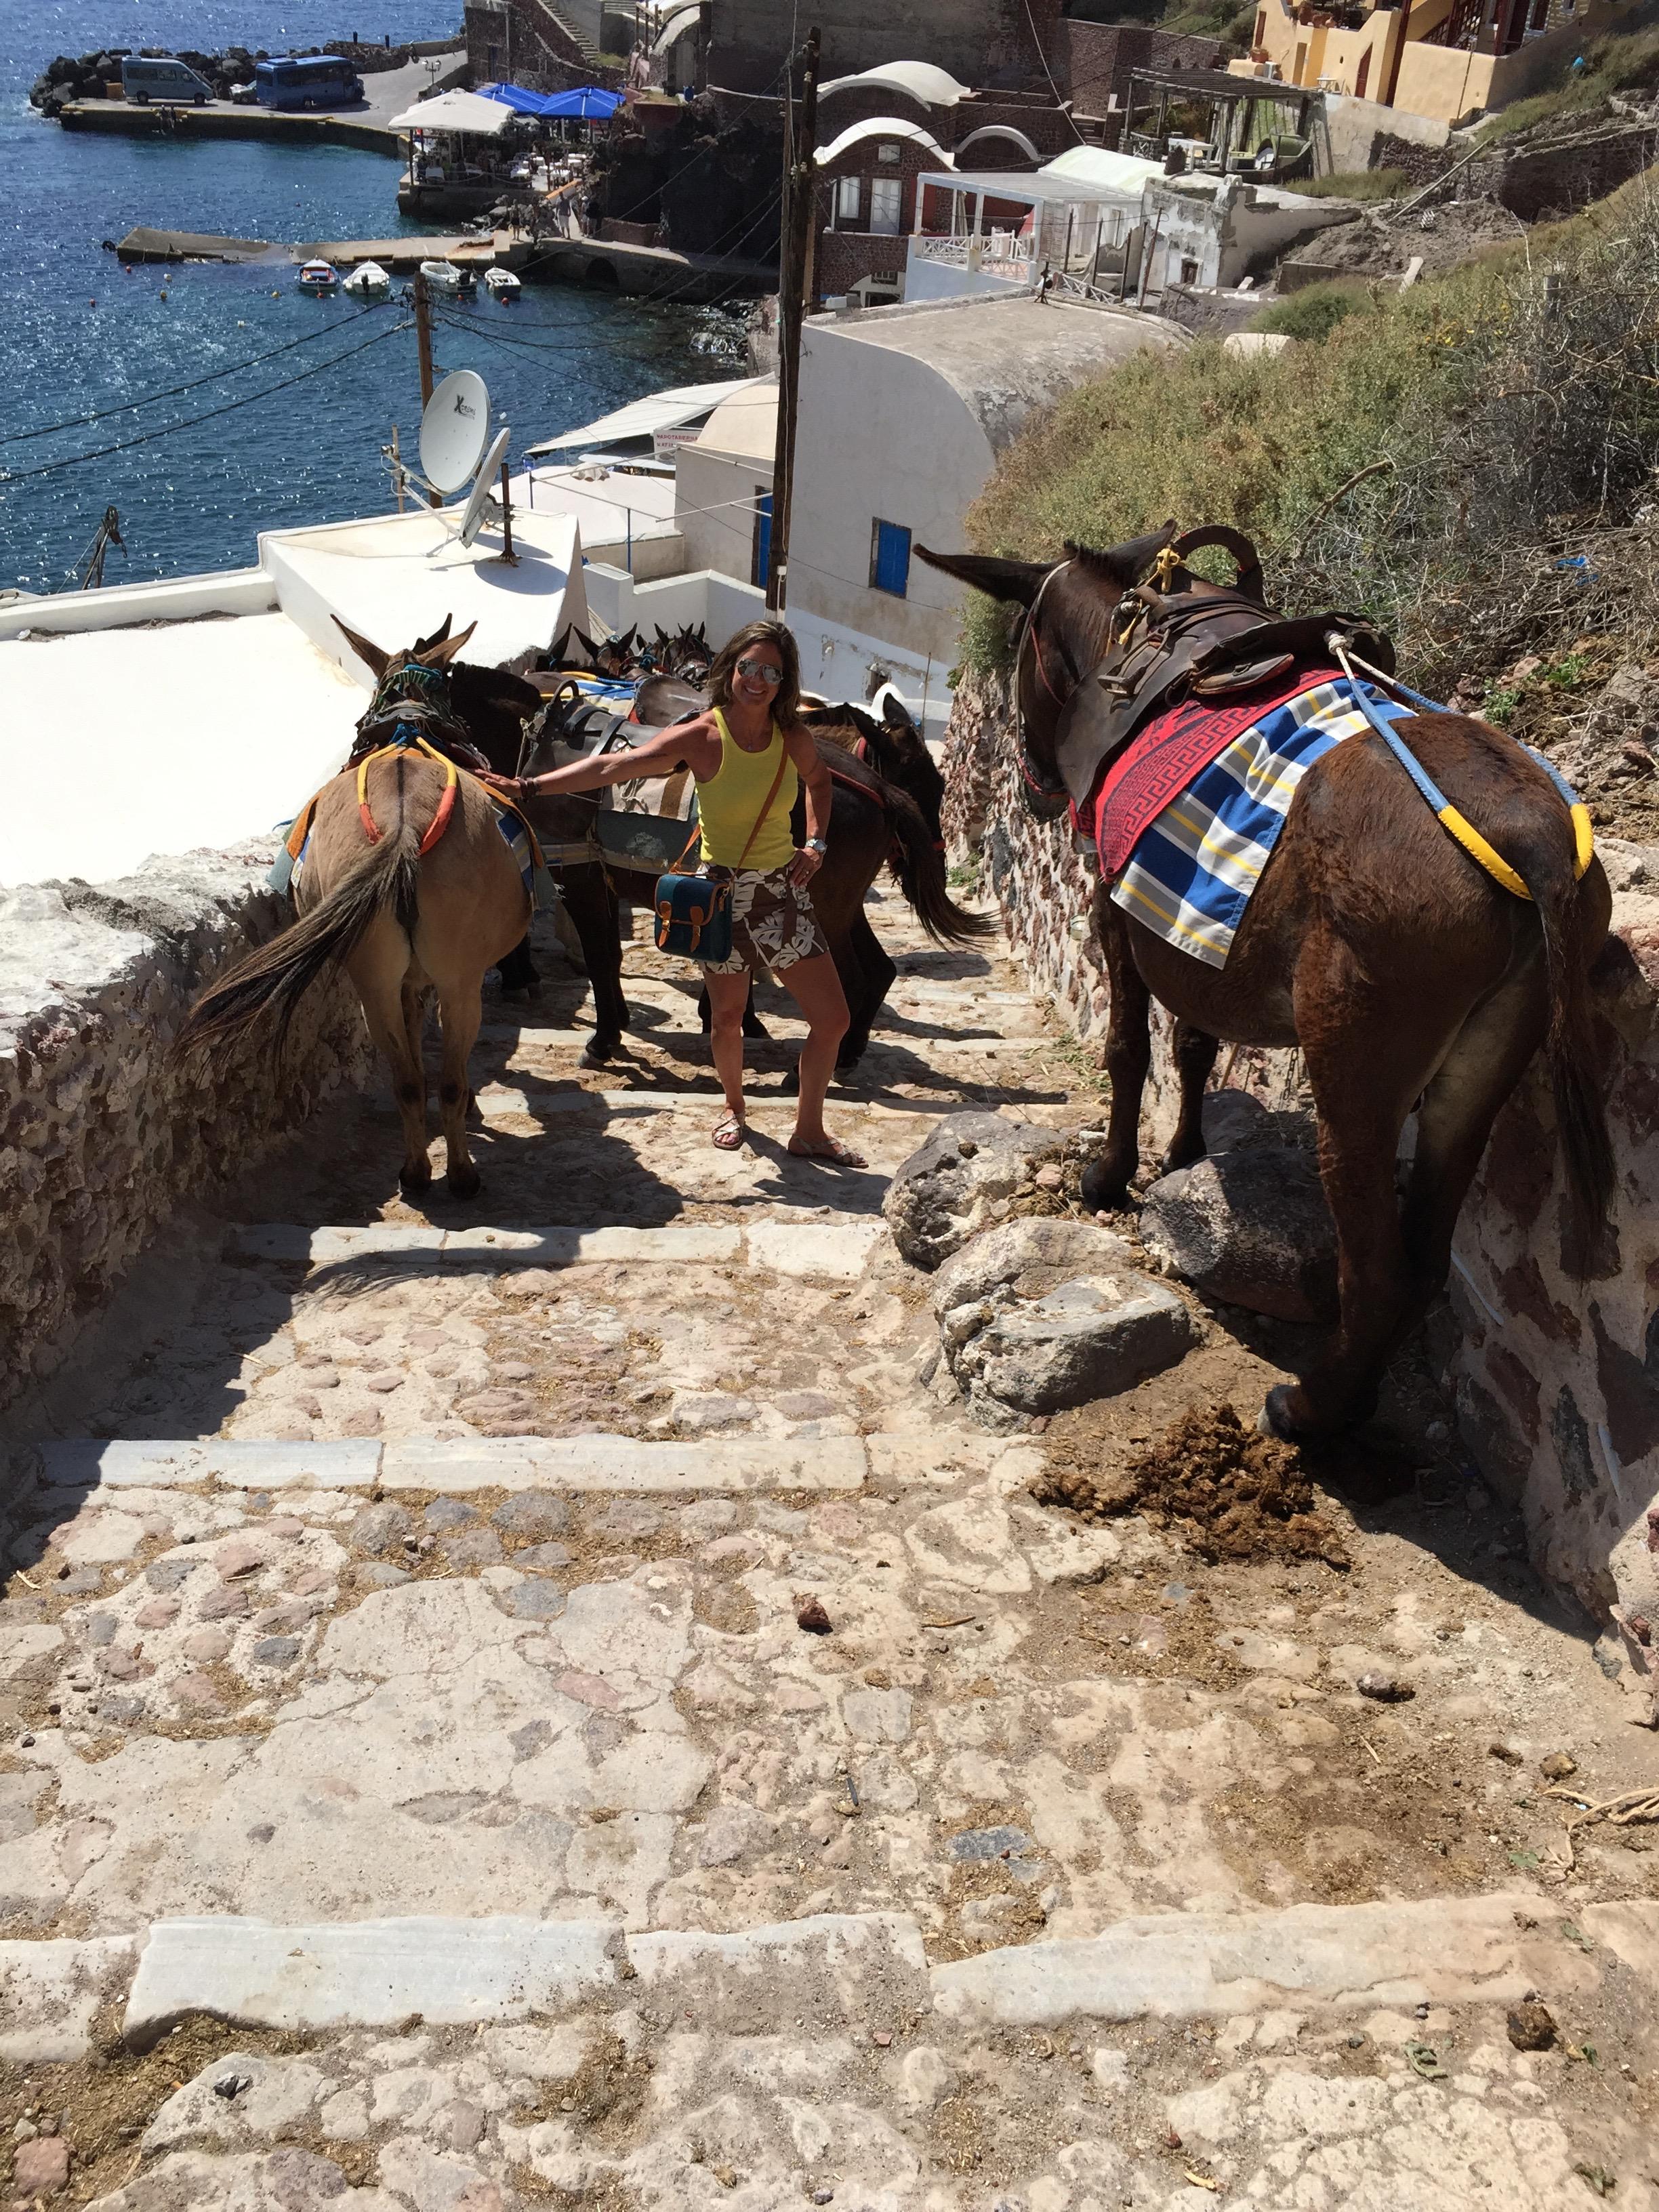 Santorini Donkey Trail